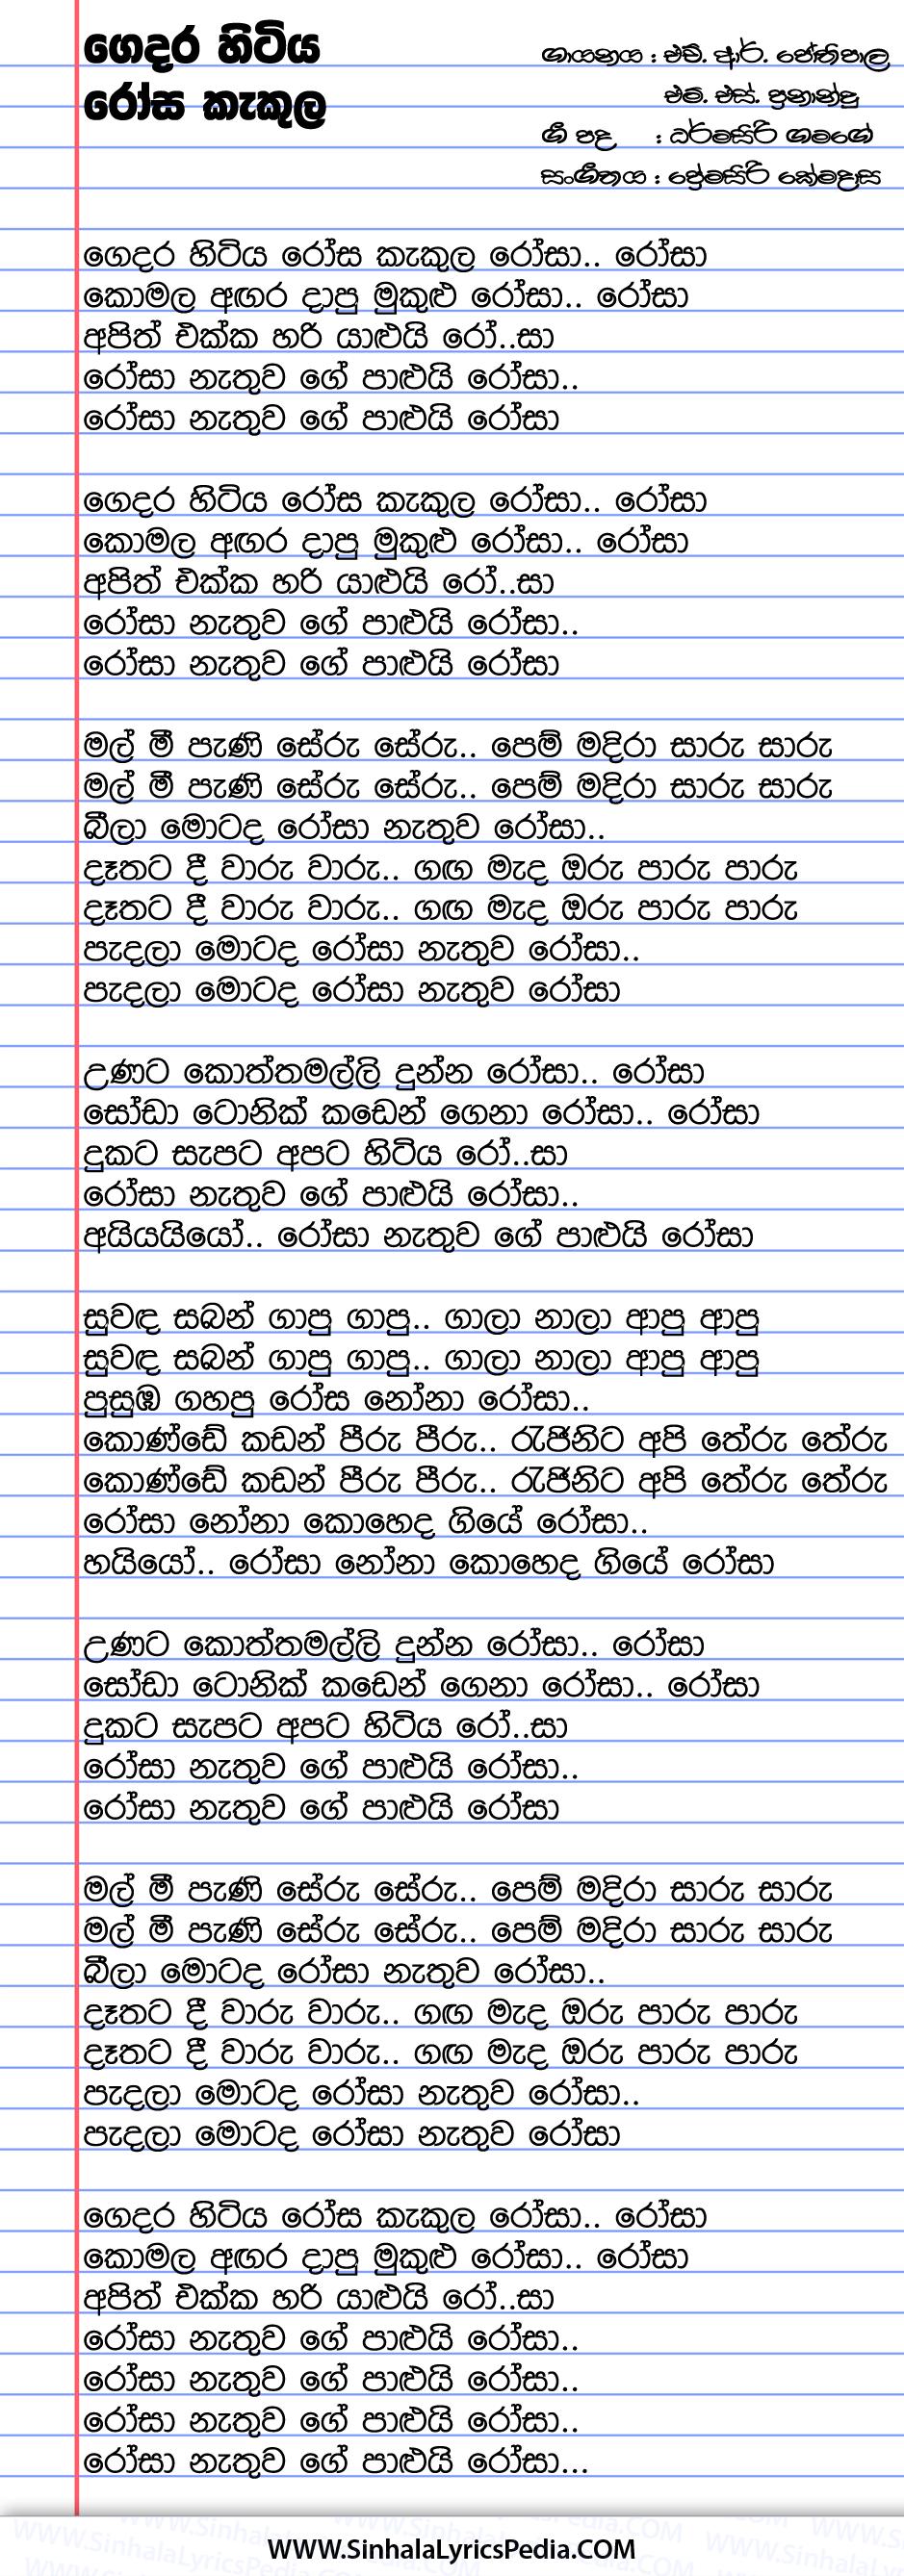 Gedara Hitiya Rosa Kekula Rosa Song Lyrics